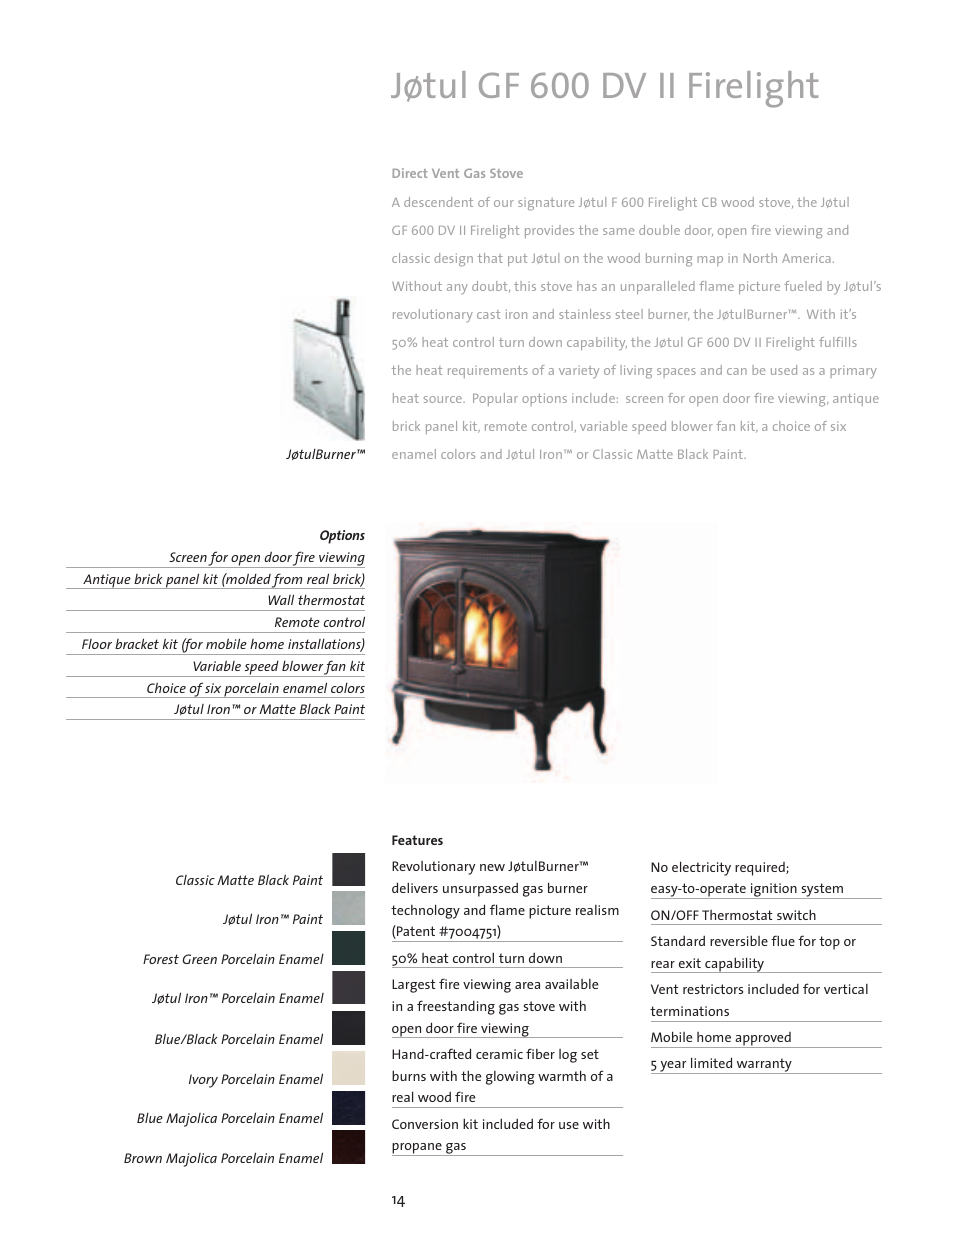 Jøtul Gf 600 Dv Ii Firelight Jotul Gas Stove User Manual